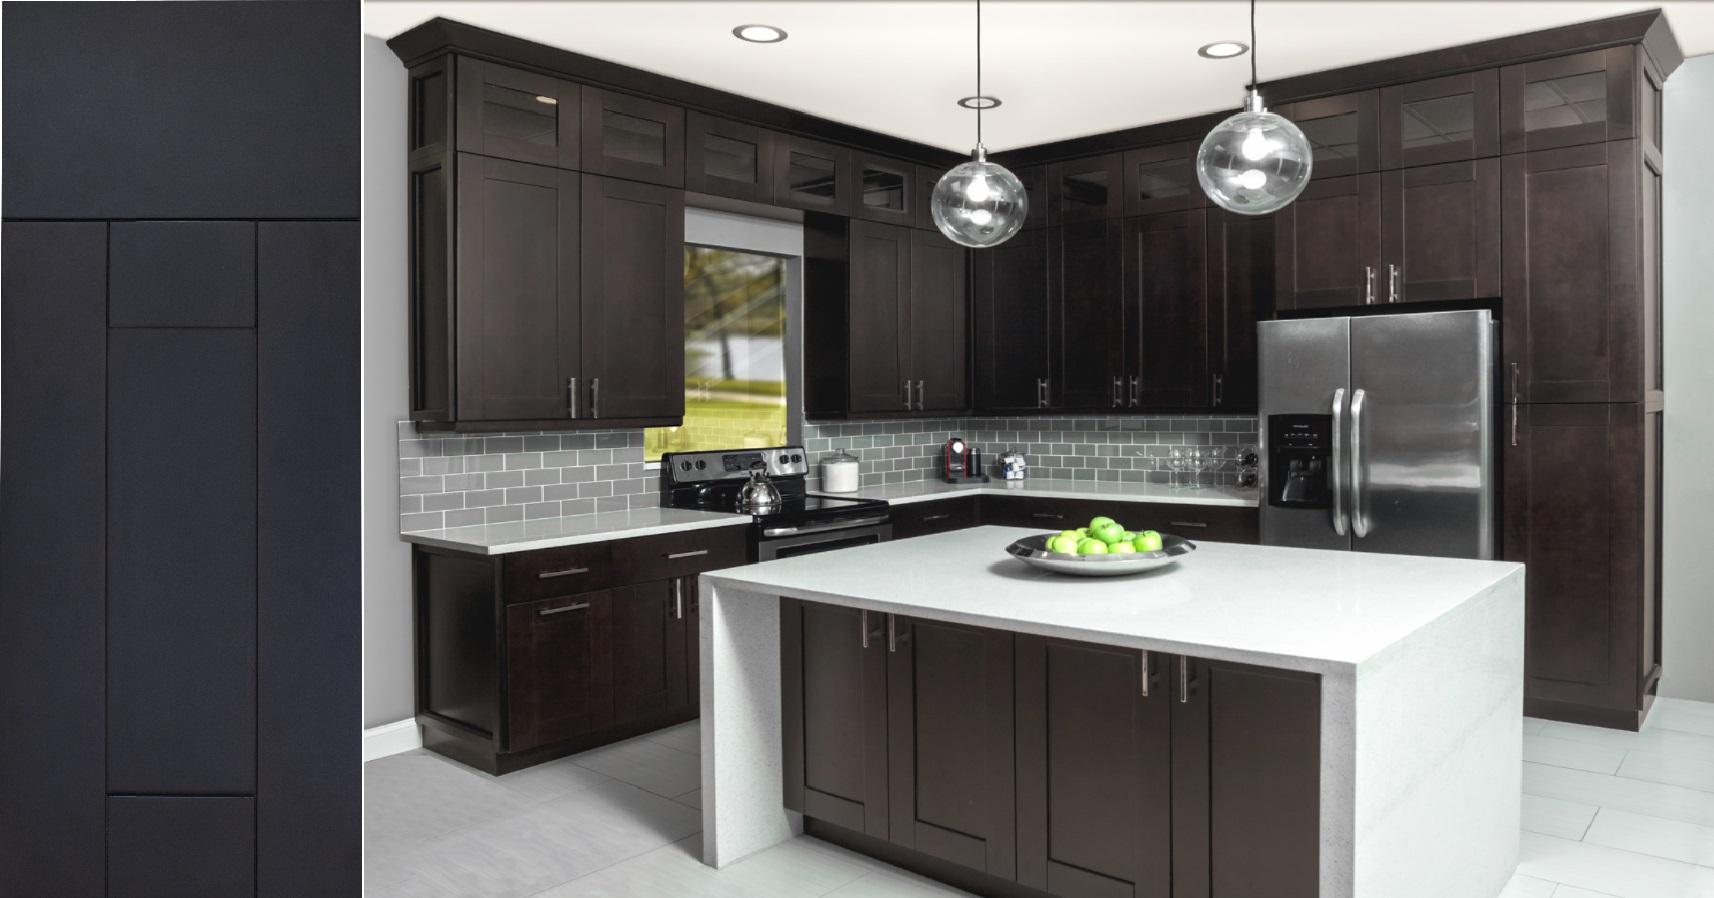 Frameless Cabinets - New Generation Kitchen & Bath - San ...